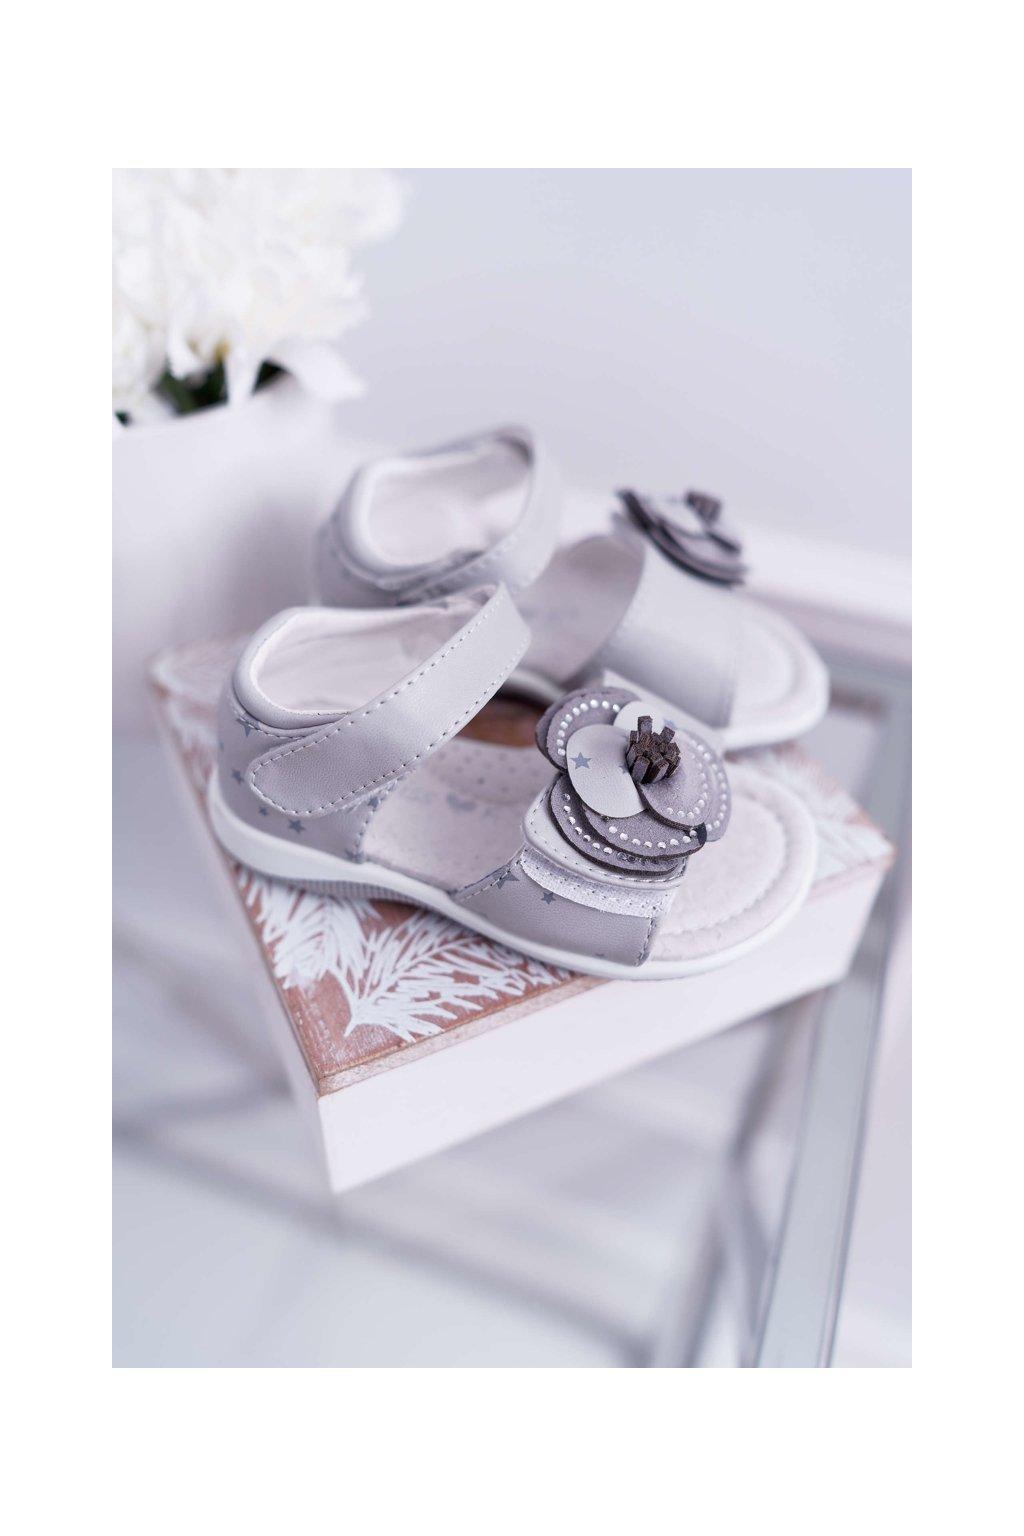 Detské Sandále pre dievčatá na suchý zips sivé Flamenko NJSK 9DZ60-0947